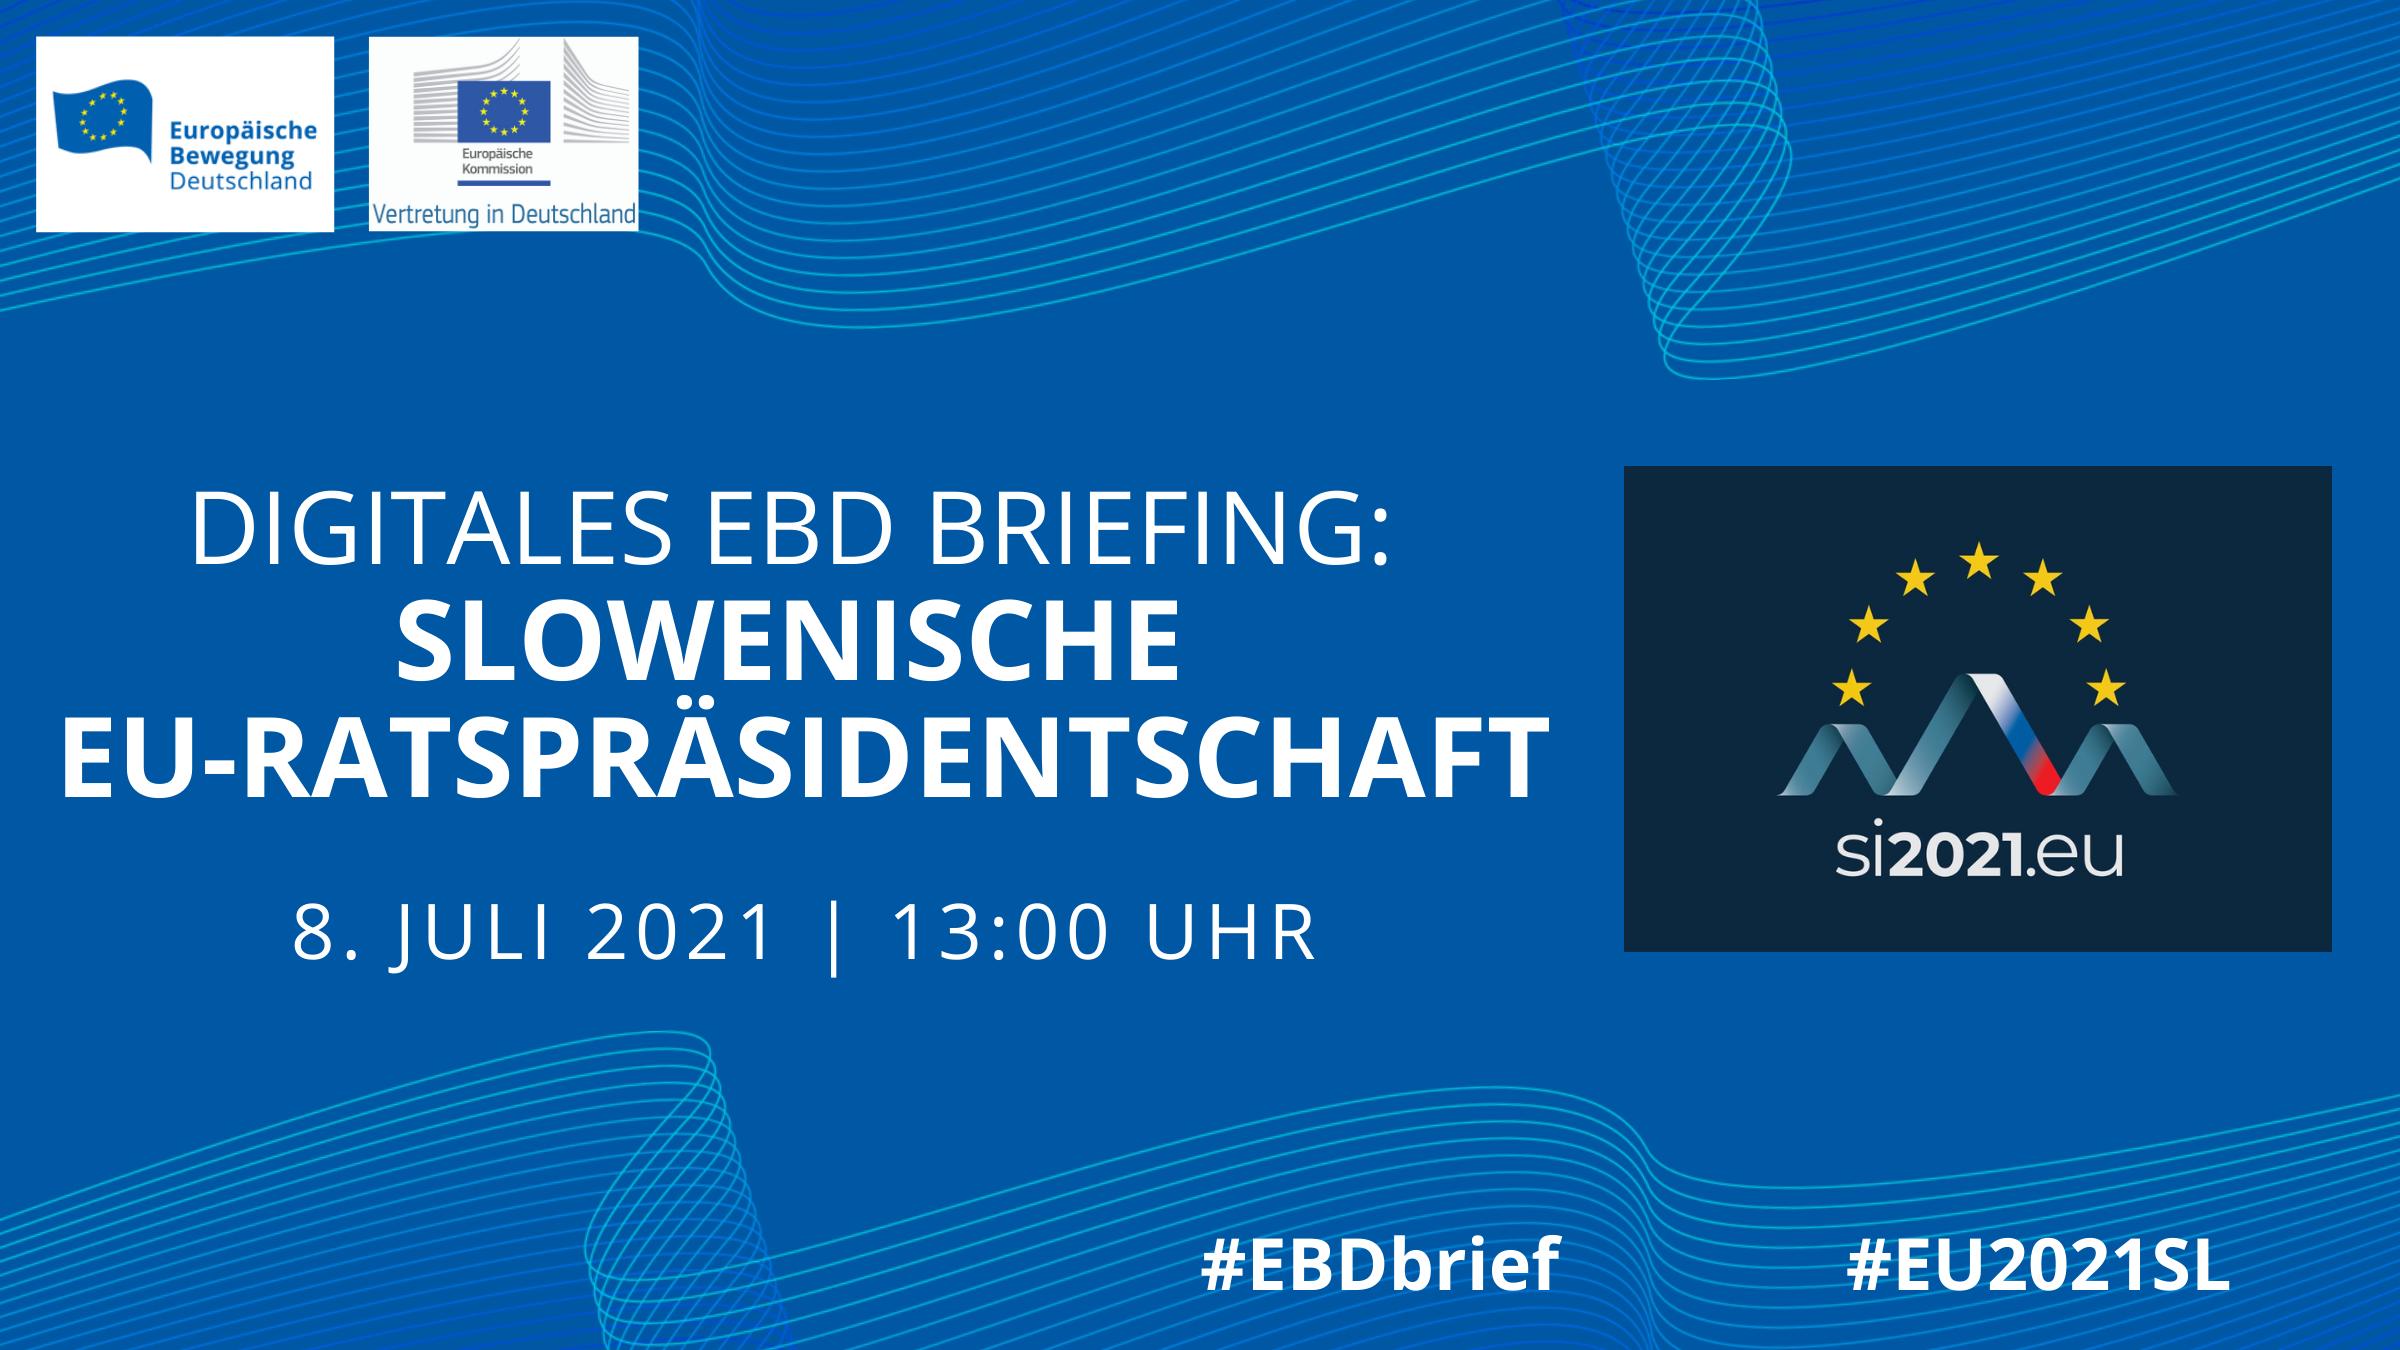 EBD Briefing: Slowenische EU-Ratspräsidentschaft